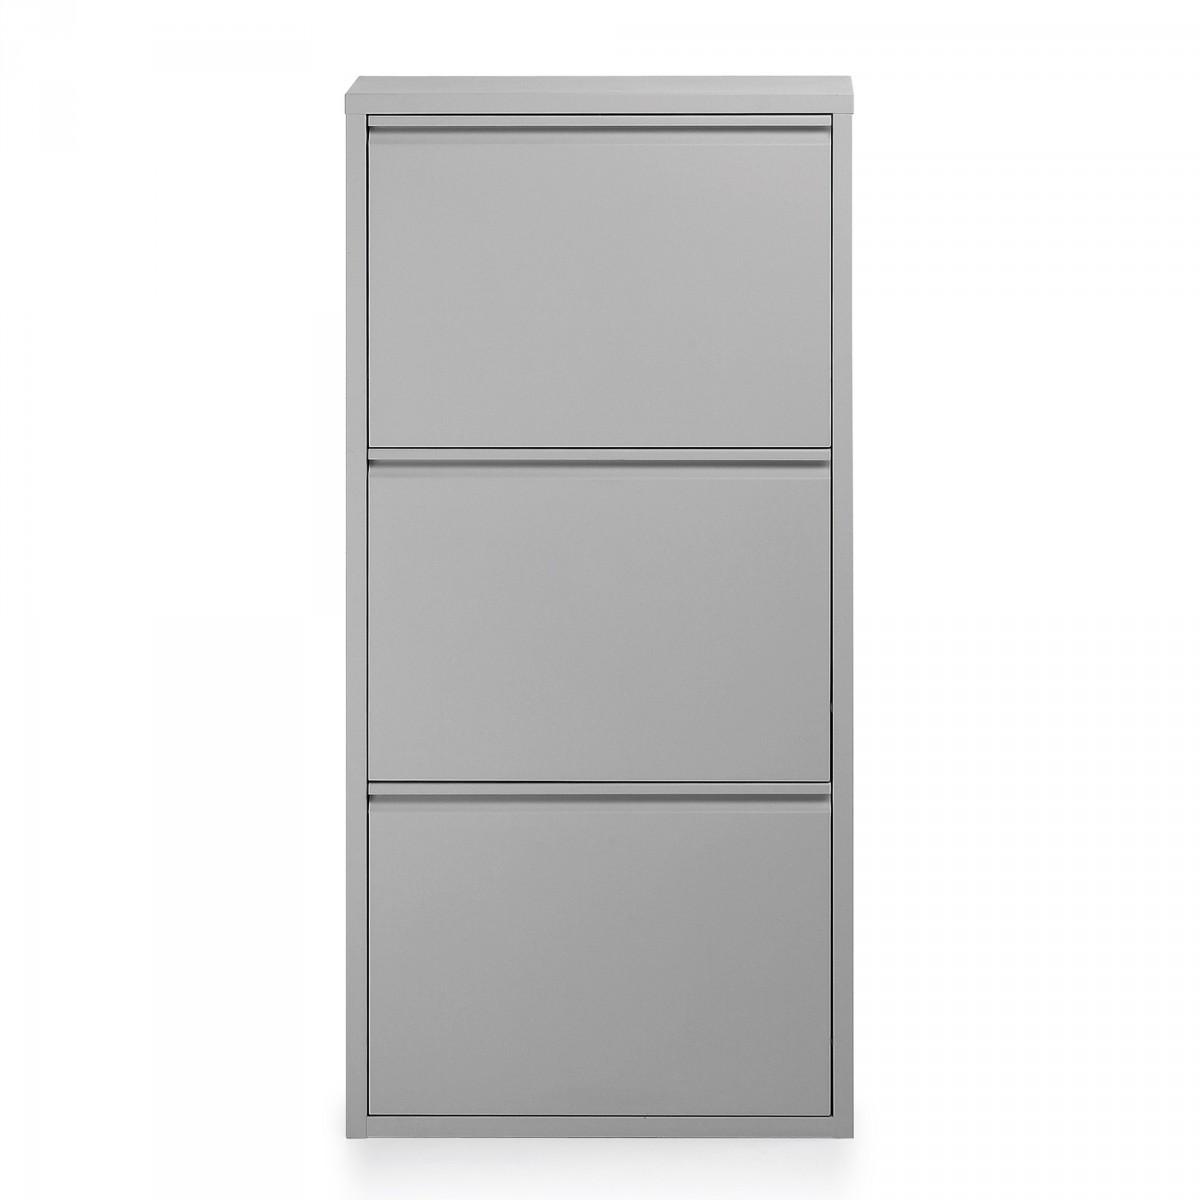 Mueble zapatero 3 estantes 513 01 plata mobles sedav for Mueble zapatero metalico